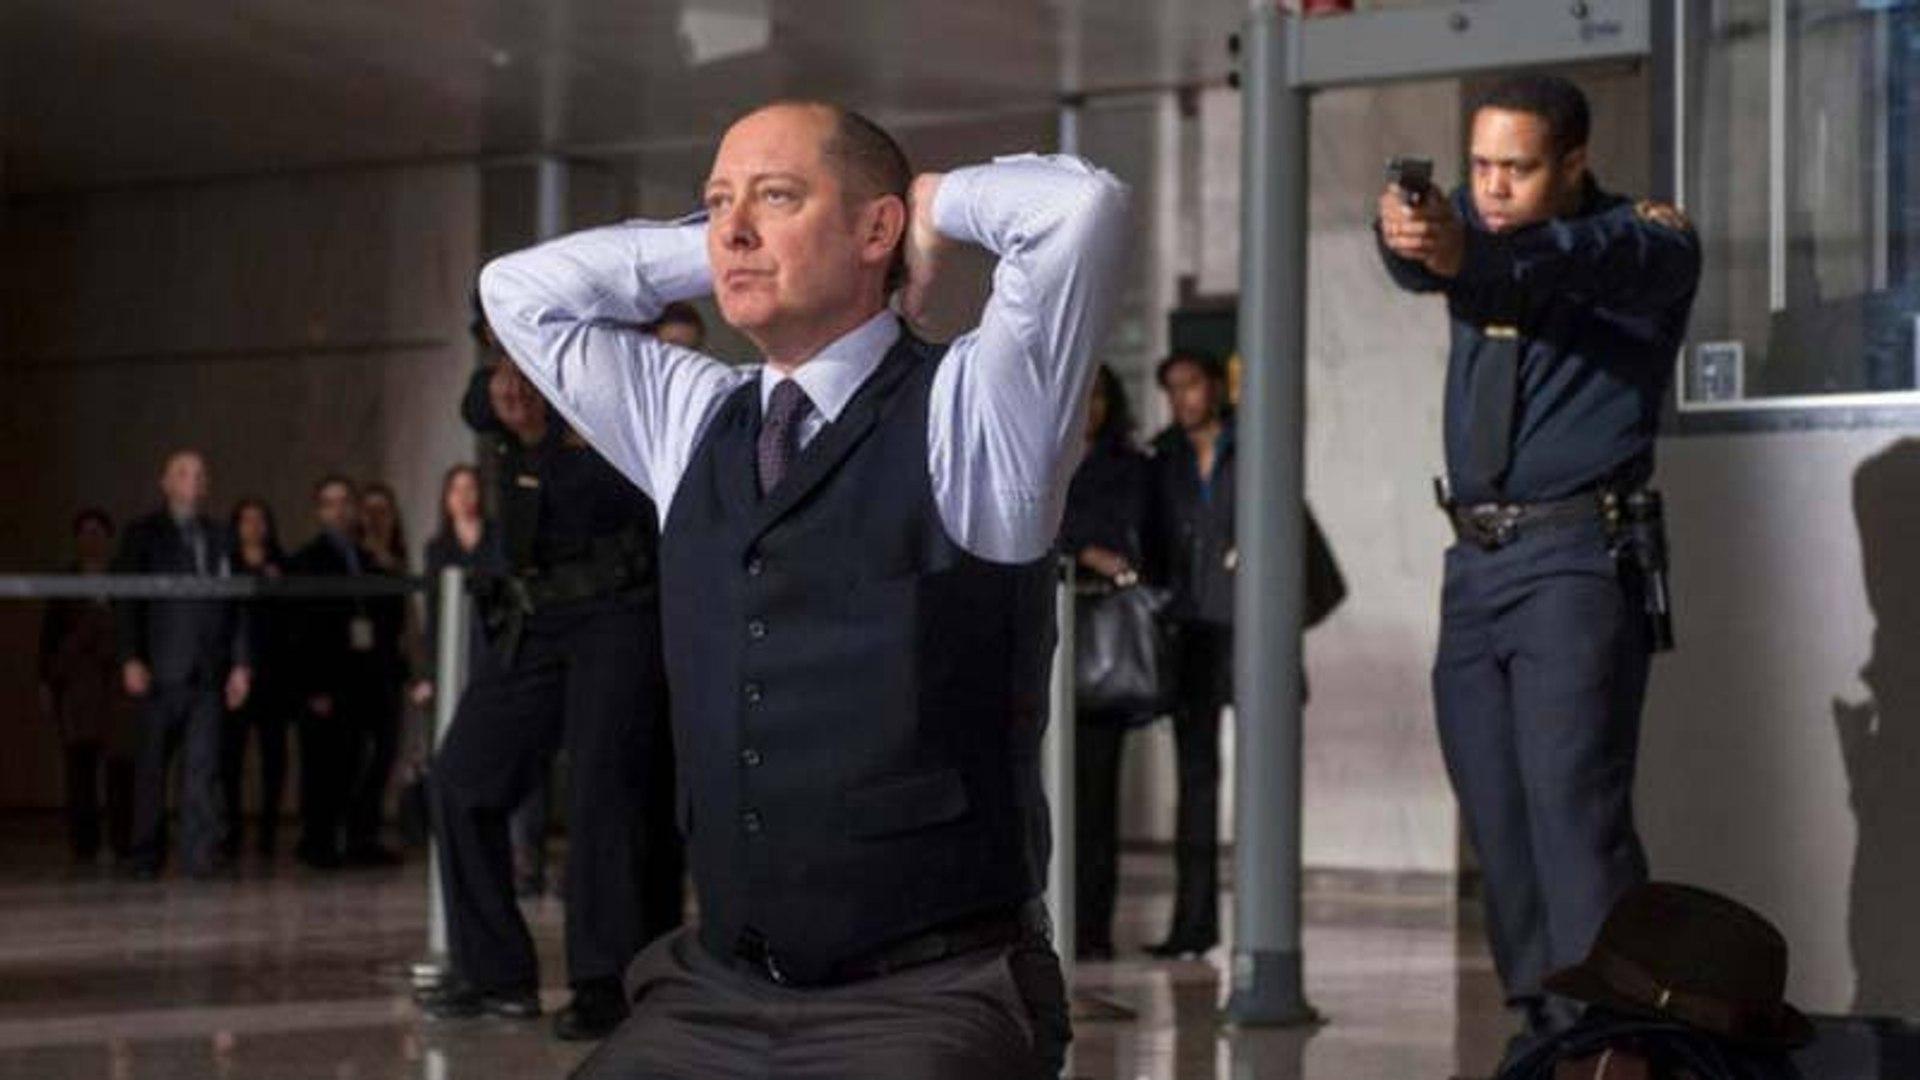 Watch The Blacklist Season 5 Episode 2 (Raymond Reddington is back) full streaming